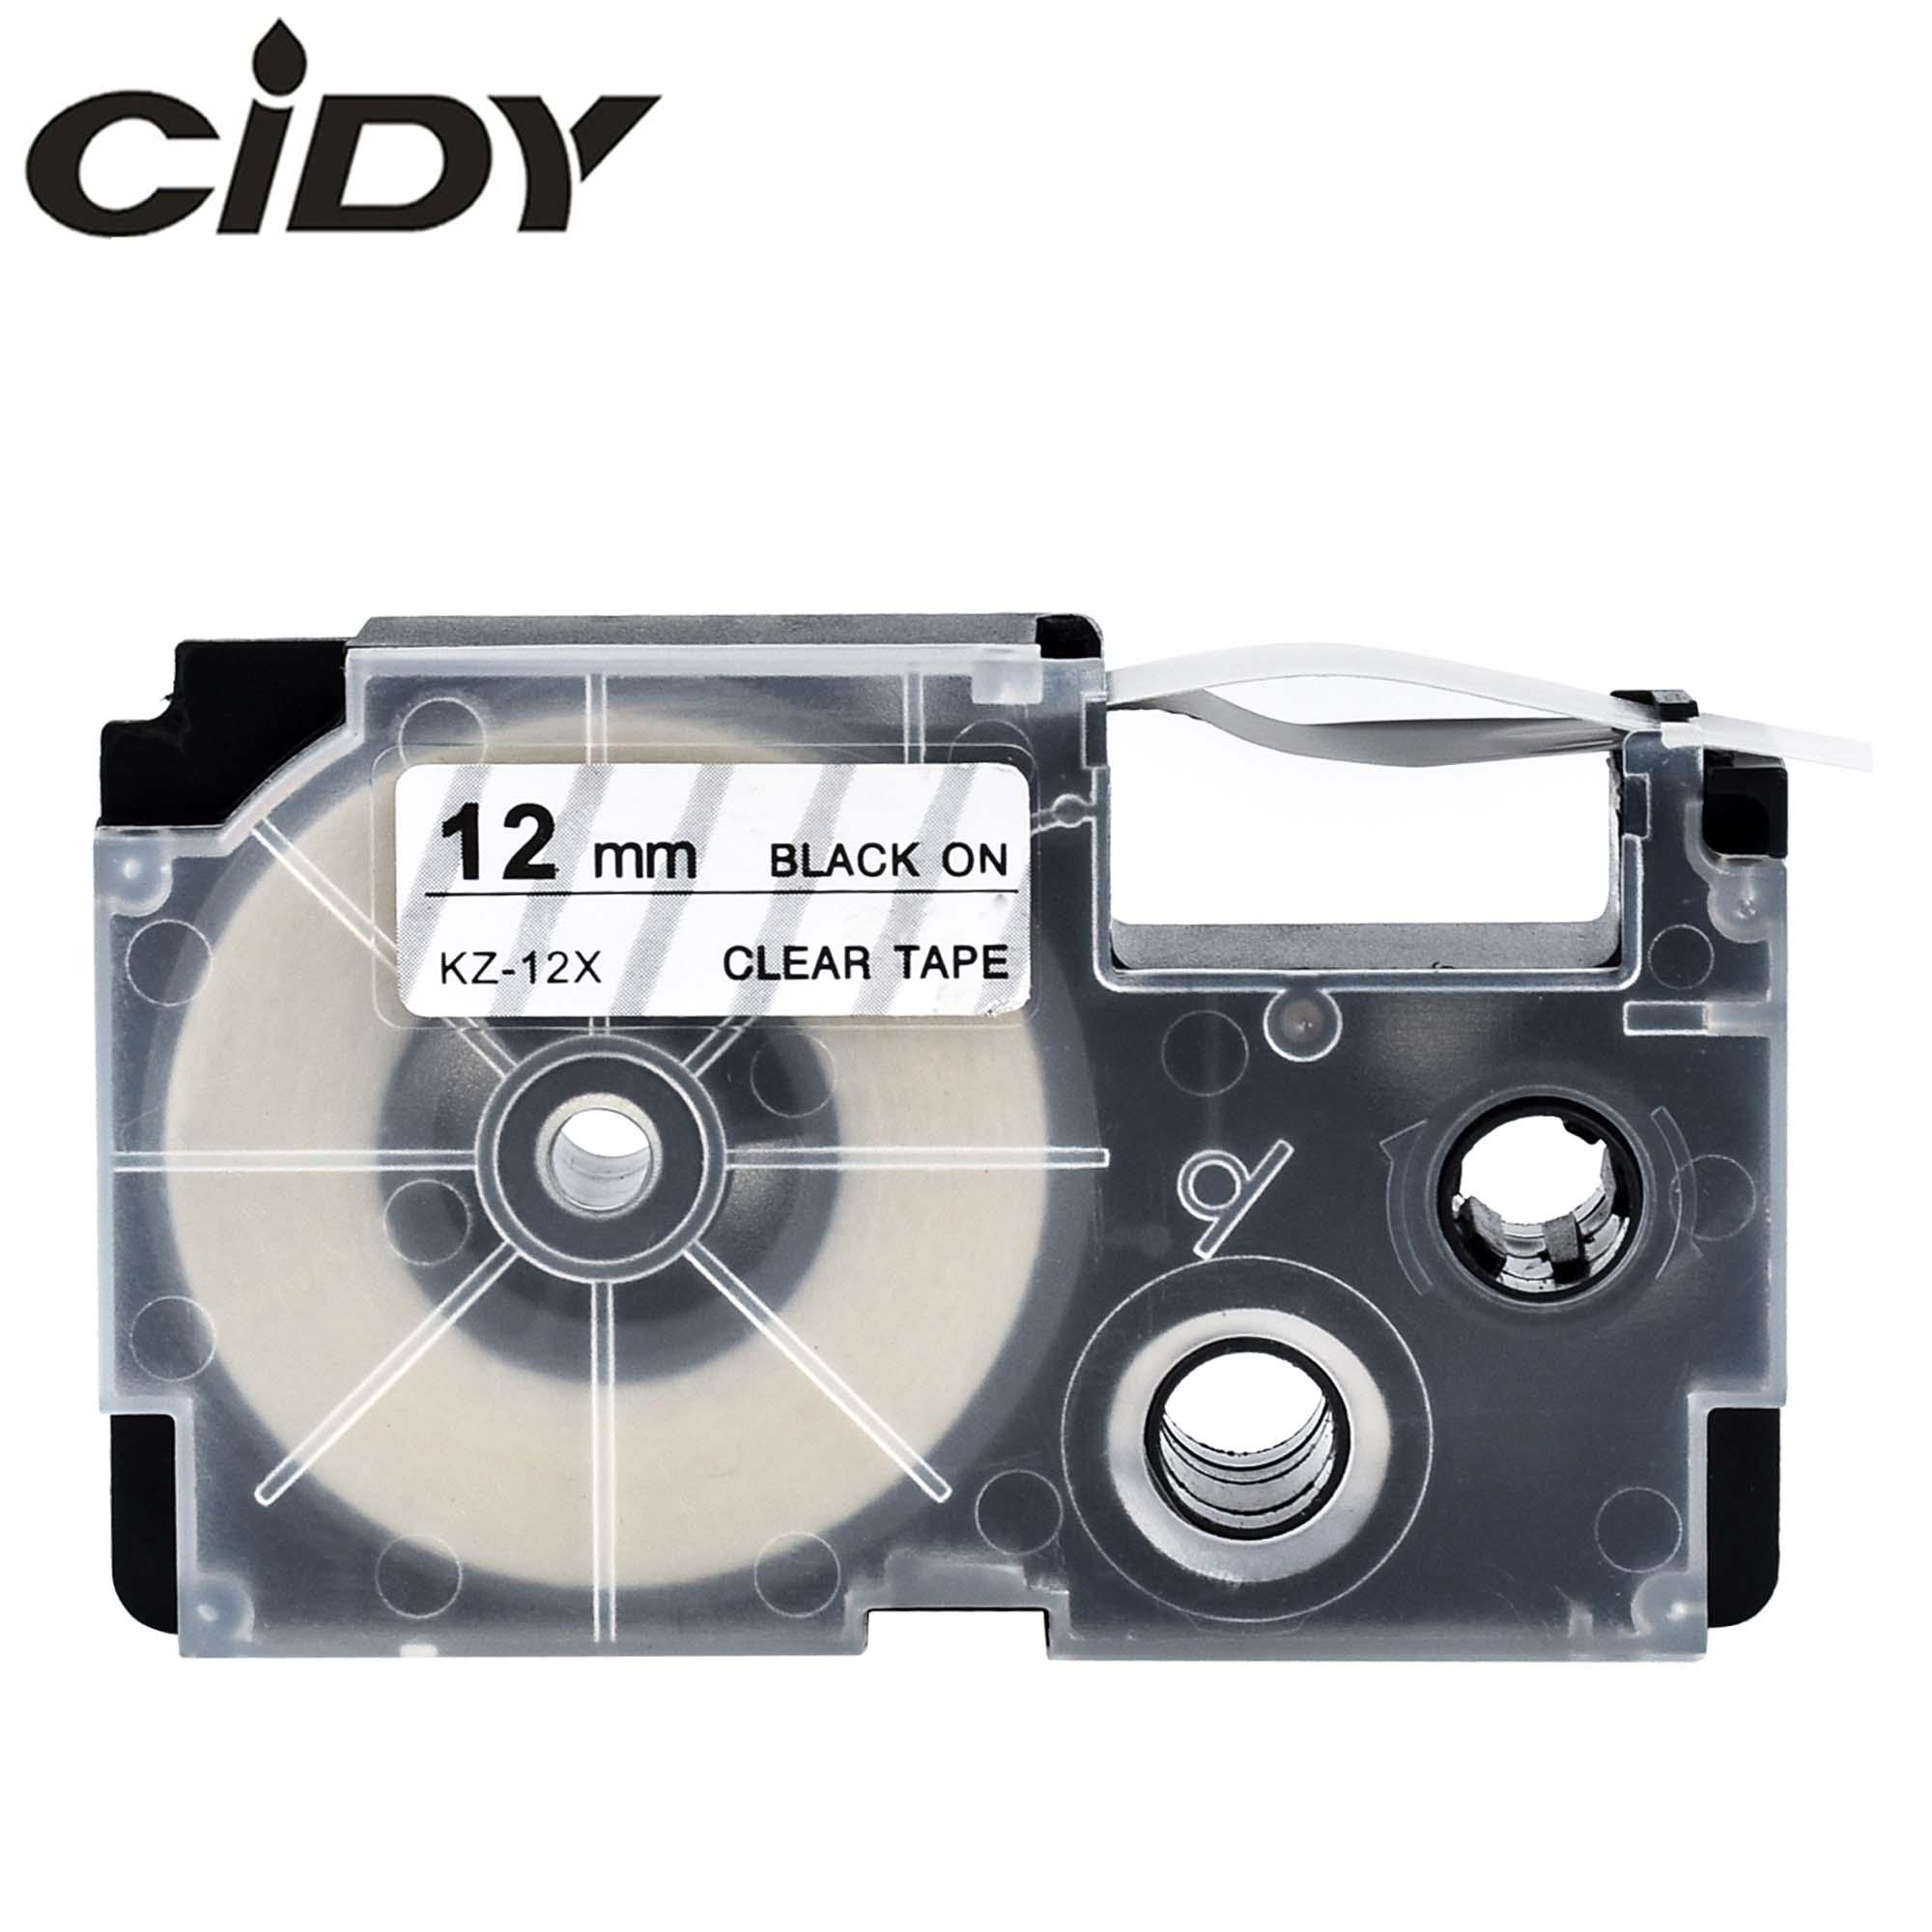 CIDY 50 Uds XR-12X Compatible con etiqueta Casio para XR12X XR 12X 12mm negro en transparente cinta etiqueta EZ impresoras KL-60L KL-120L